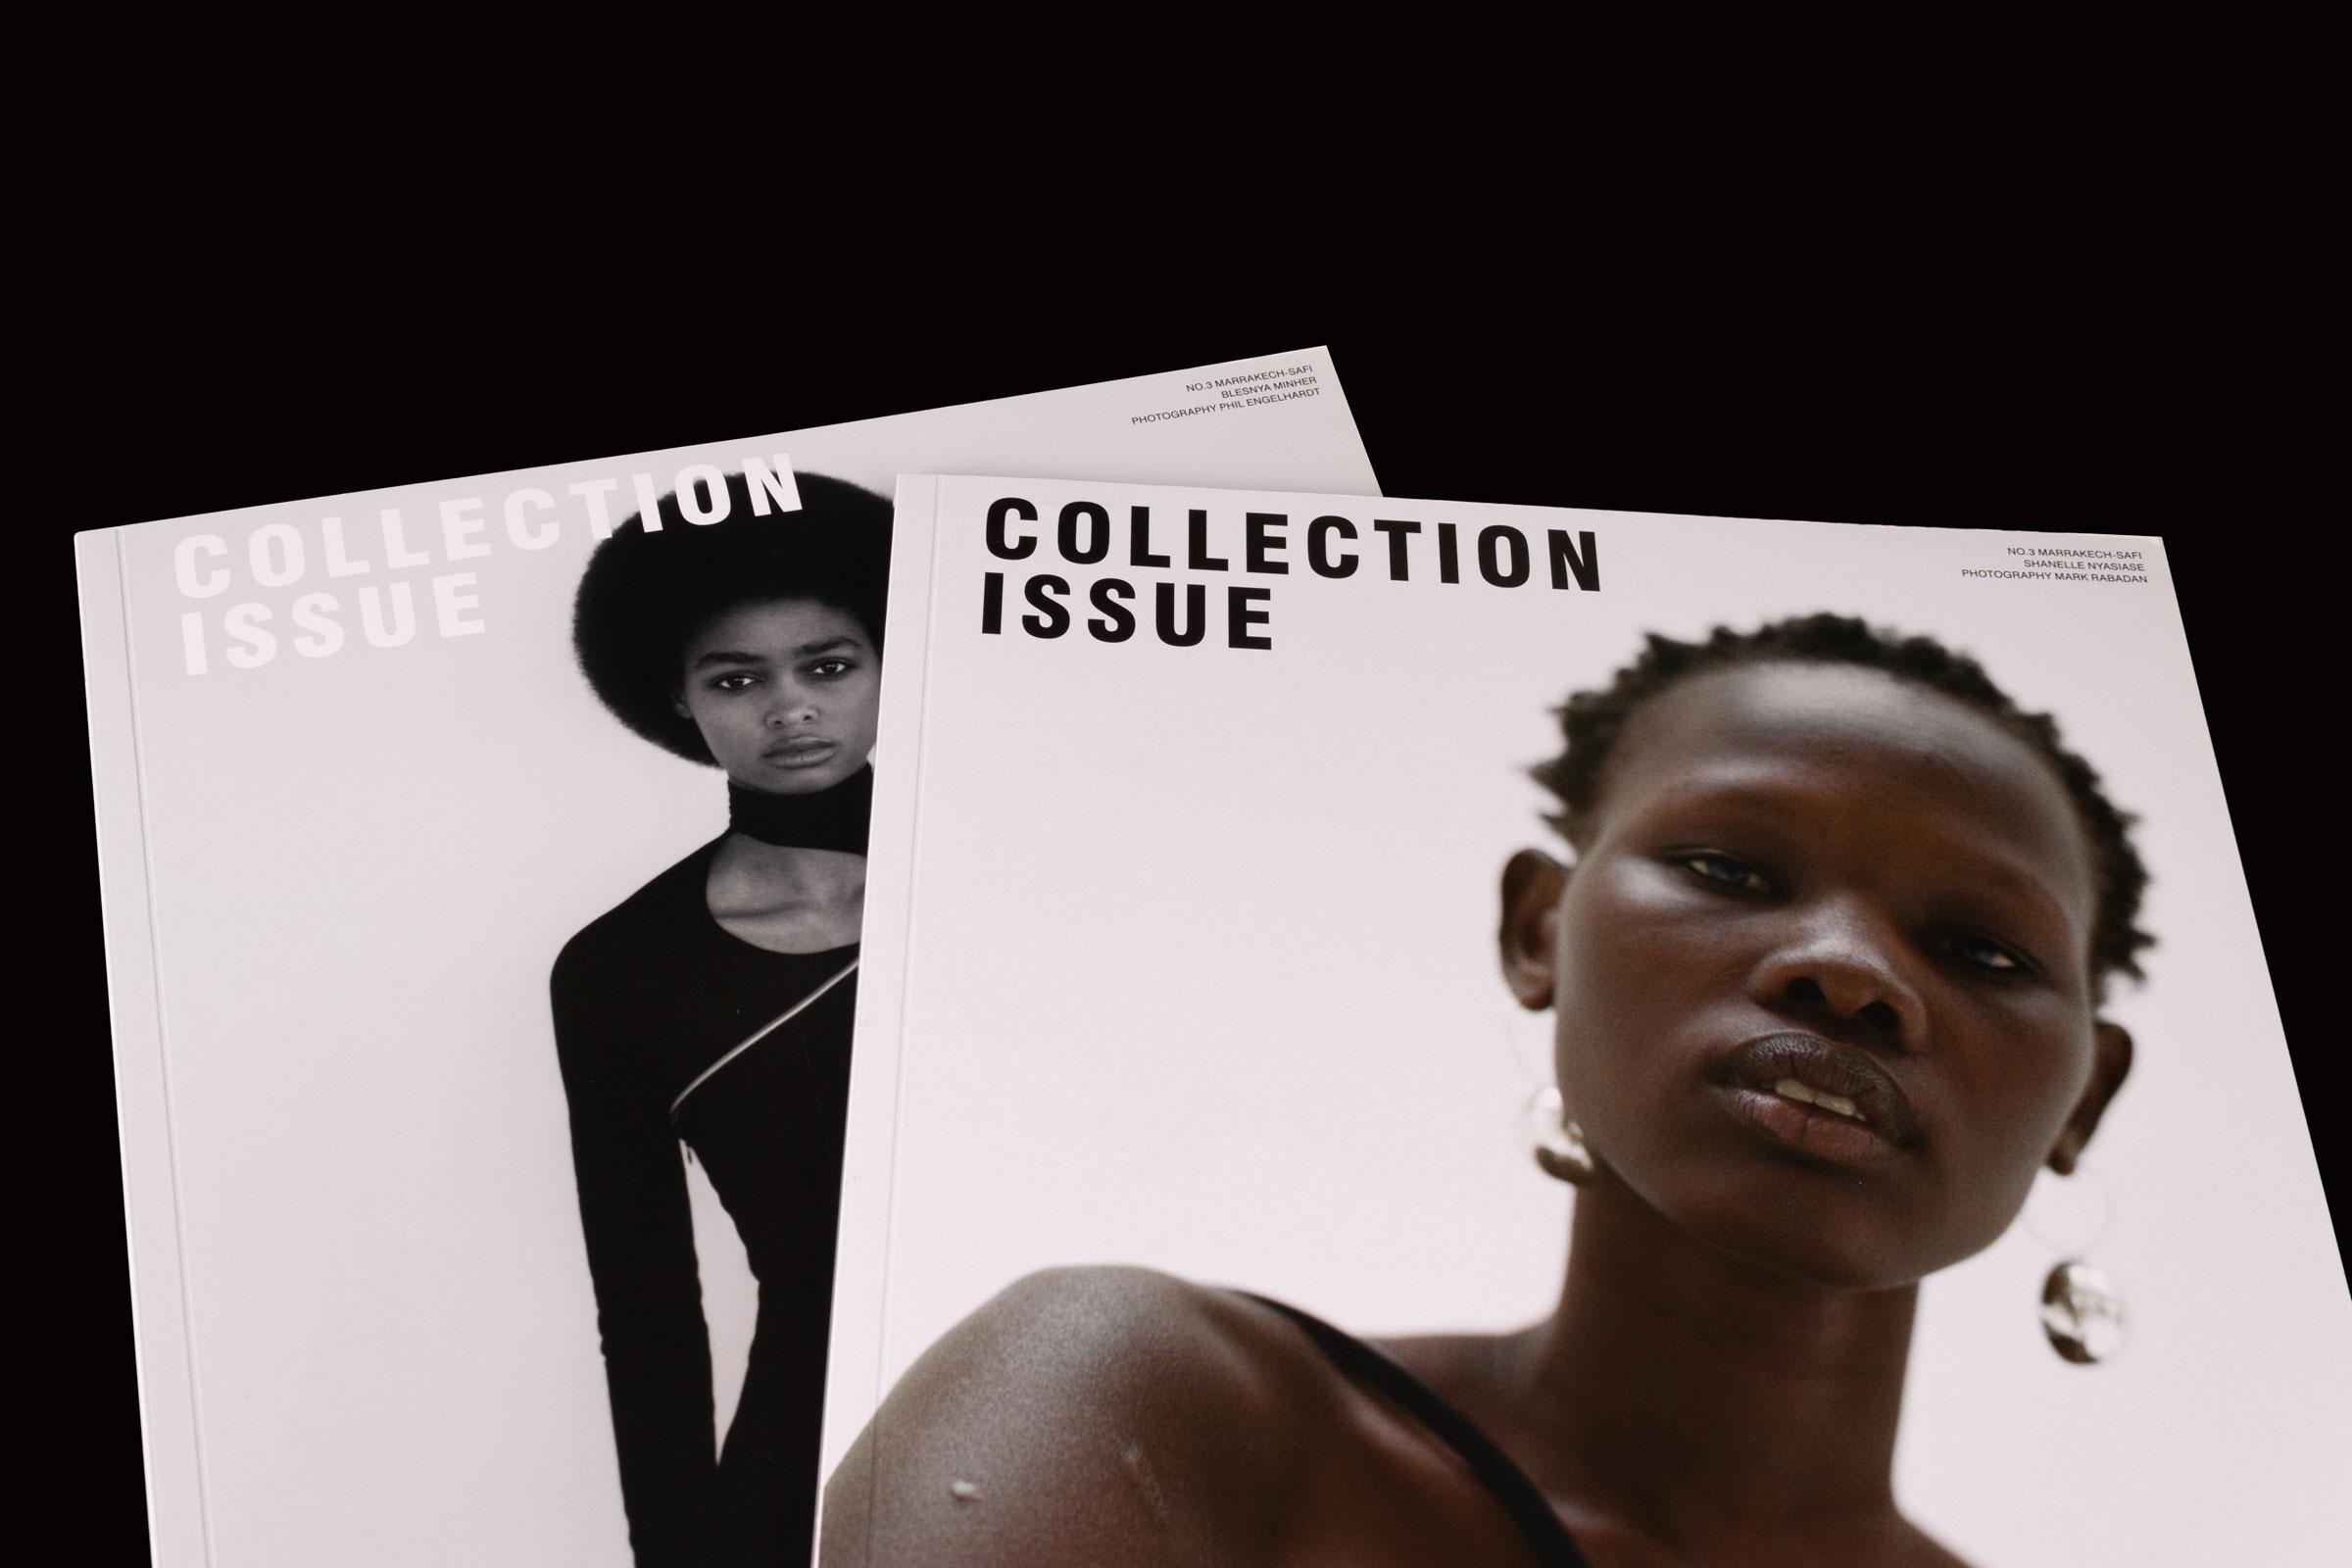 Revista Collection Issue paper Fedrigoni